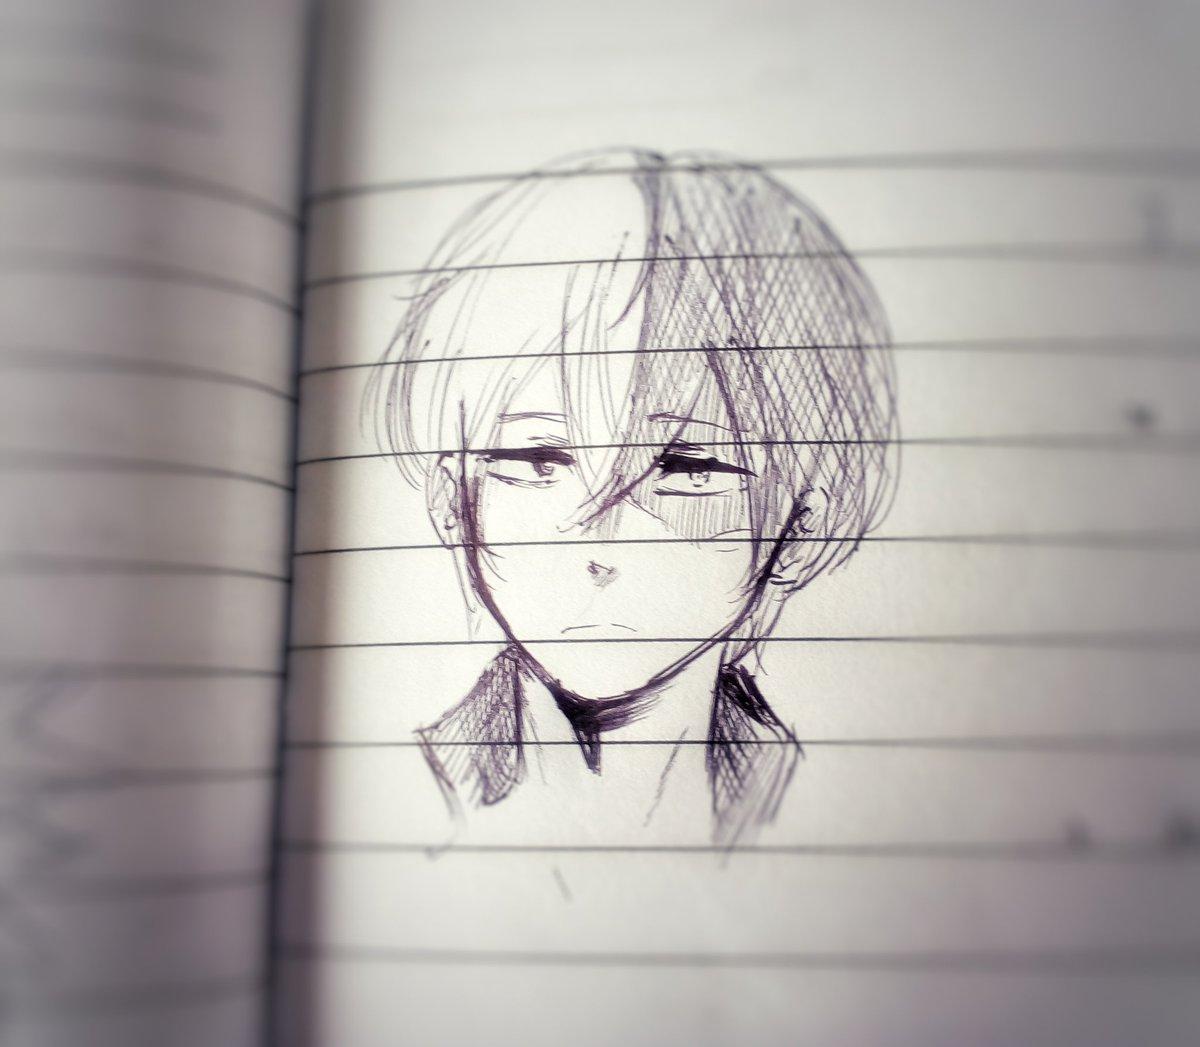 maru commissions closed on twitter shouuuuto more bored doodles in class maru commissions closed on twitter